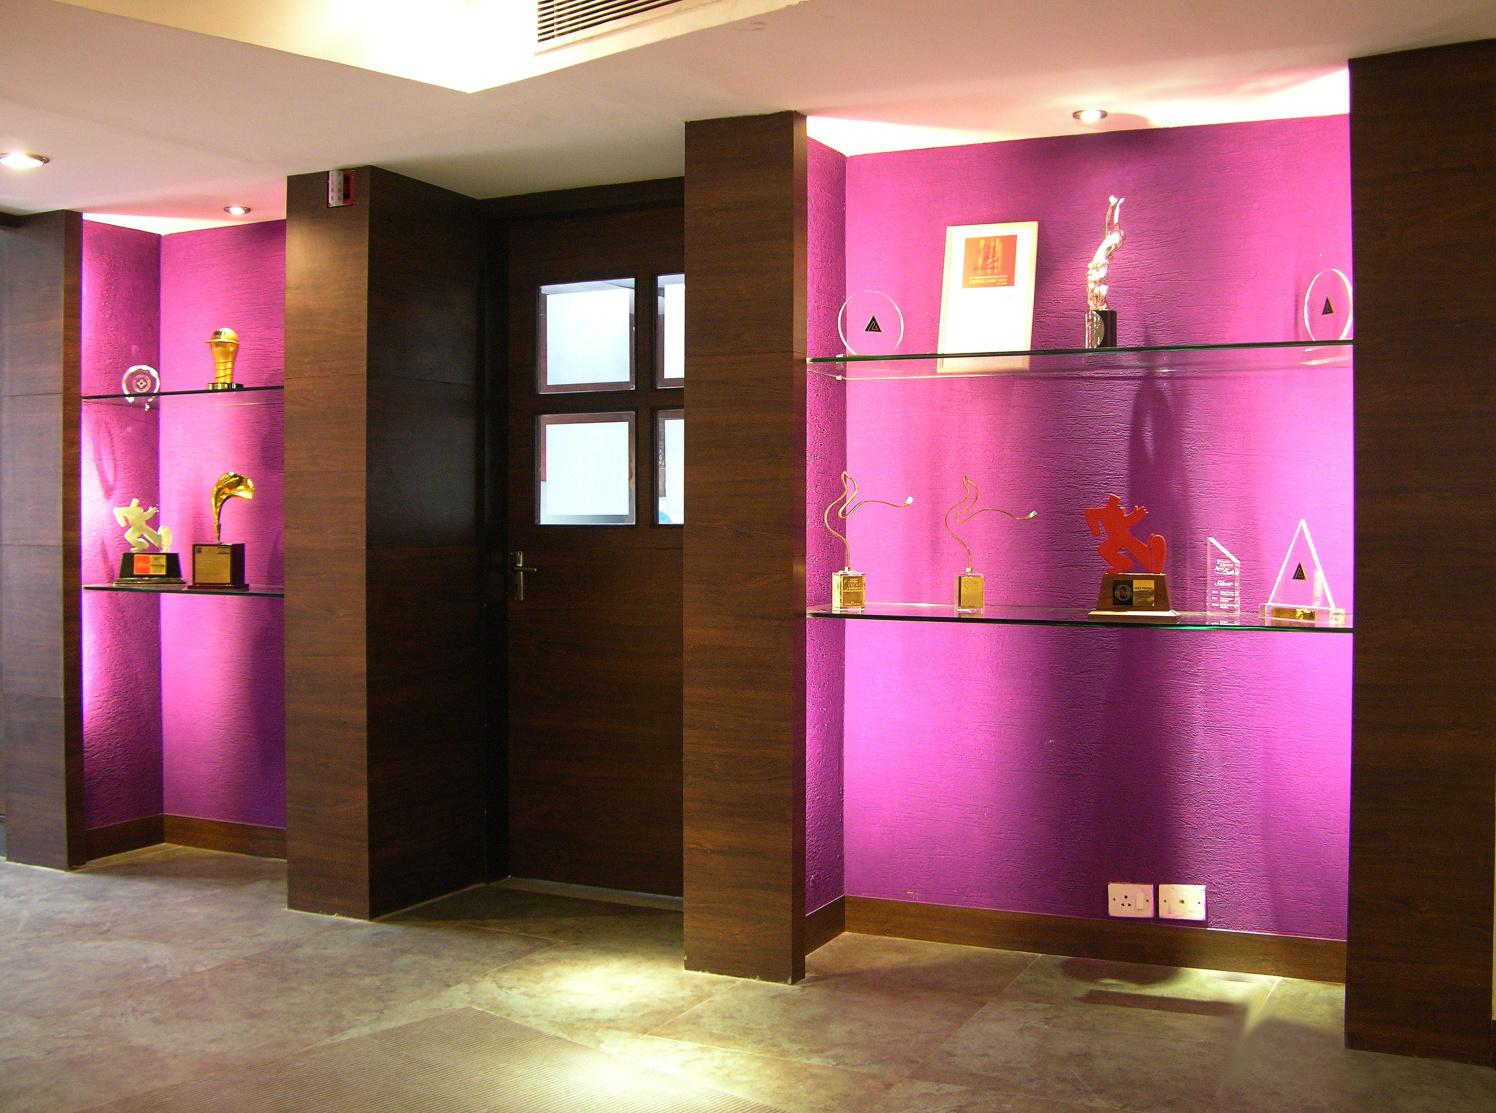 Office Reception Area by Vijay Kapur Designs Modern | Interior Design Photos & Ideas